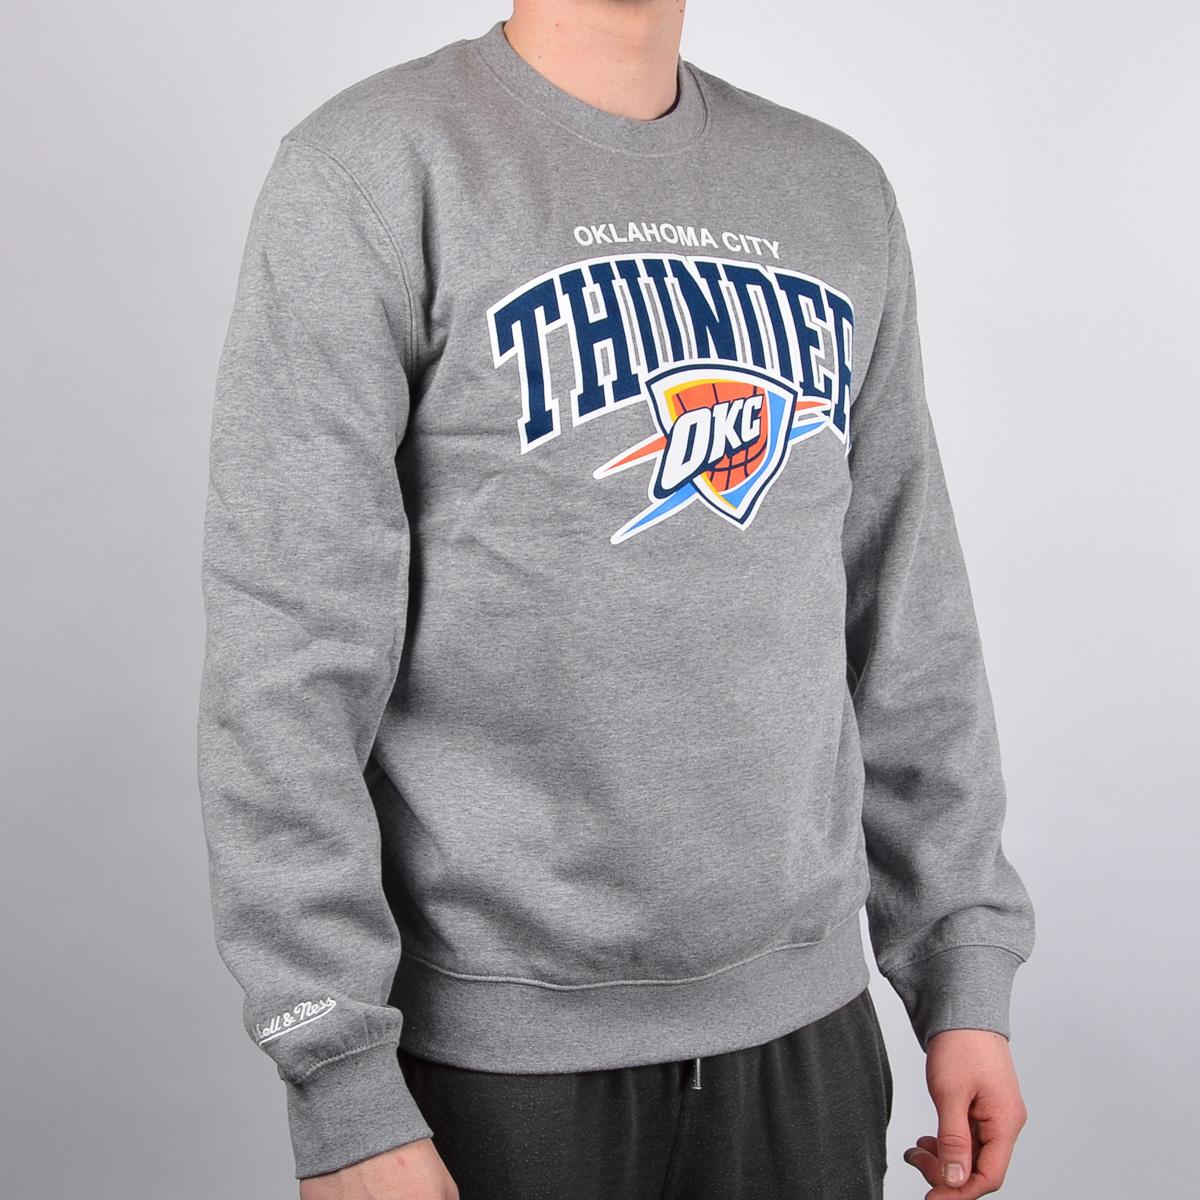 sports shoes 8d7ec cc795 Mitchell & Ness Oklahoma City Thunder Team Arch Crew - NBA ...